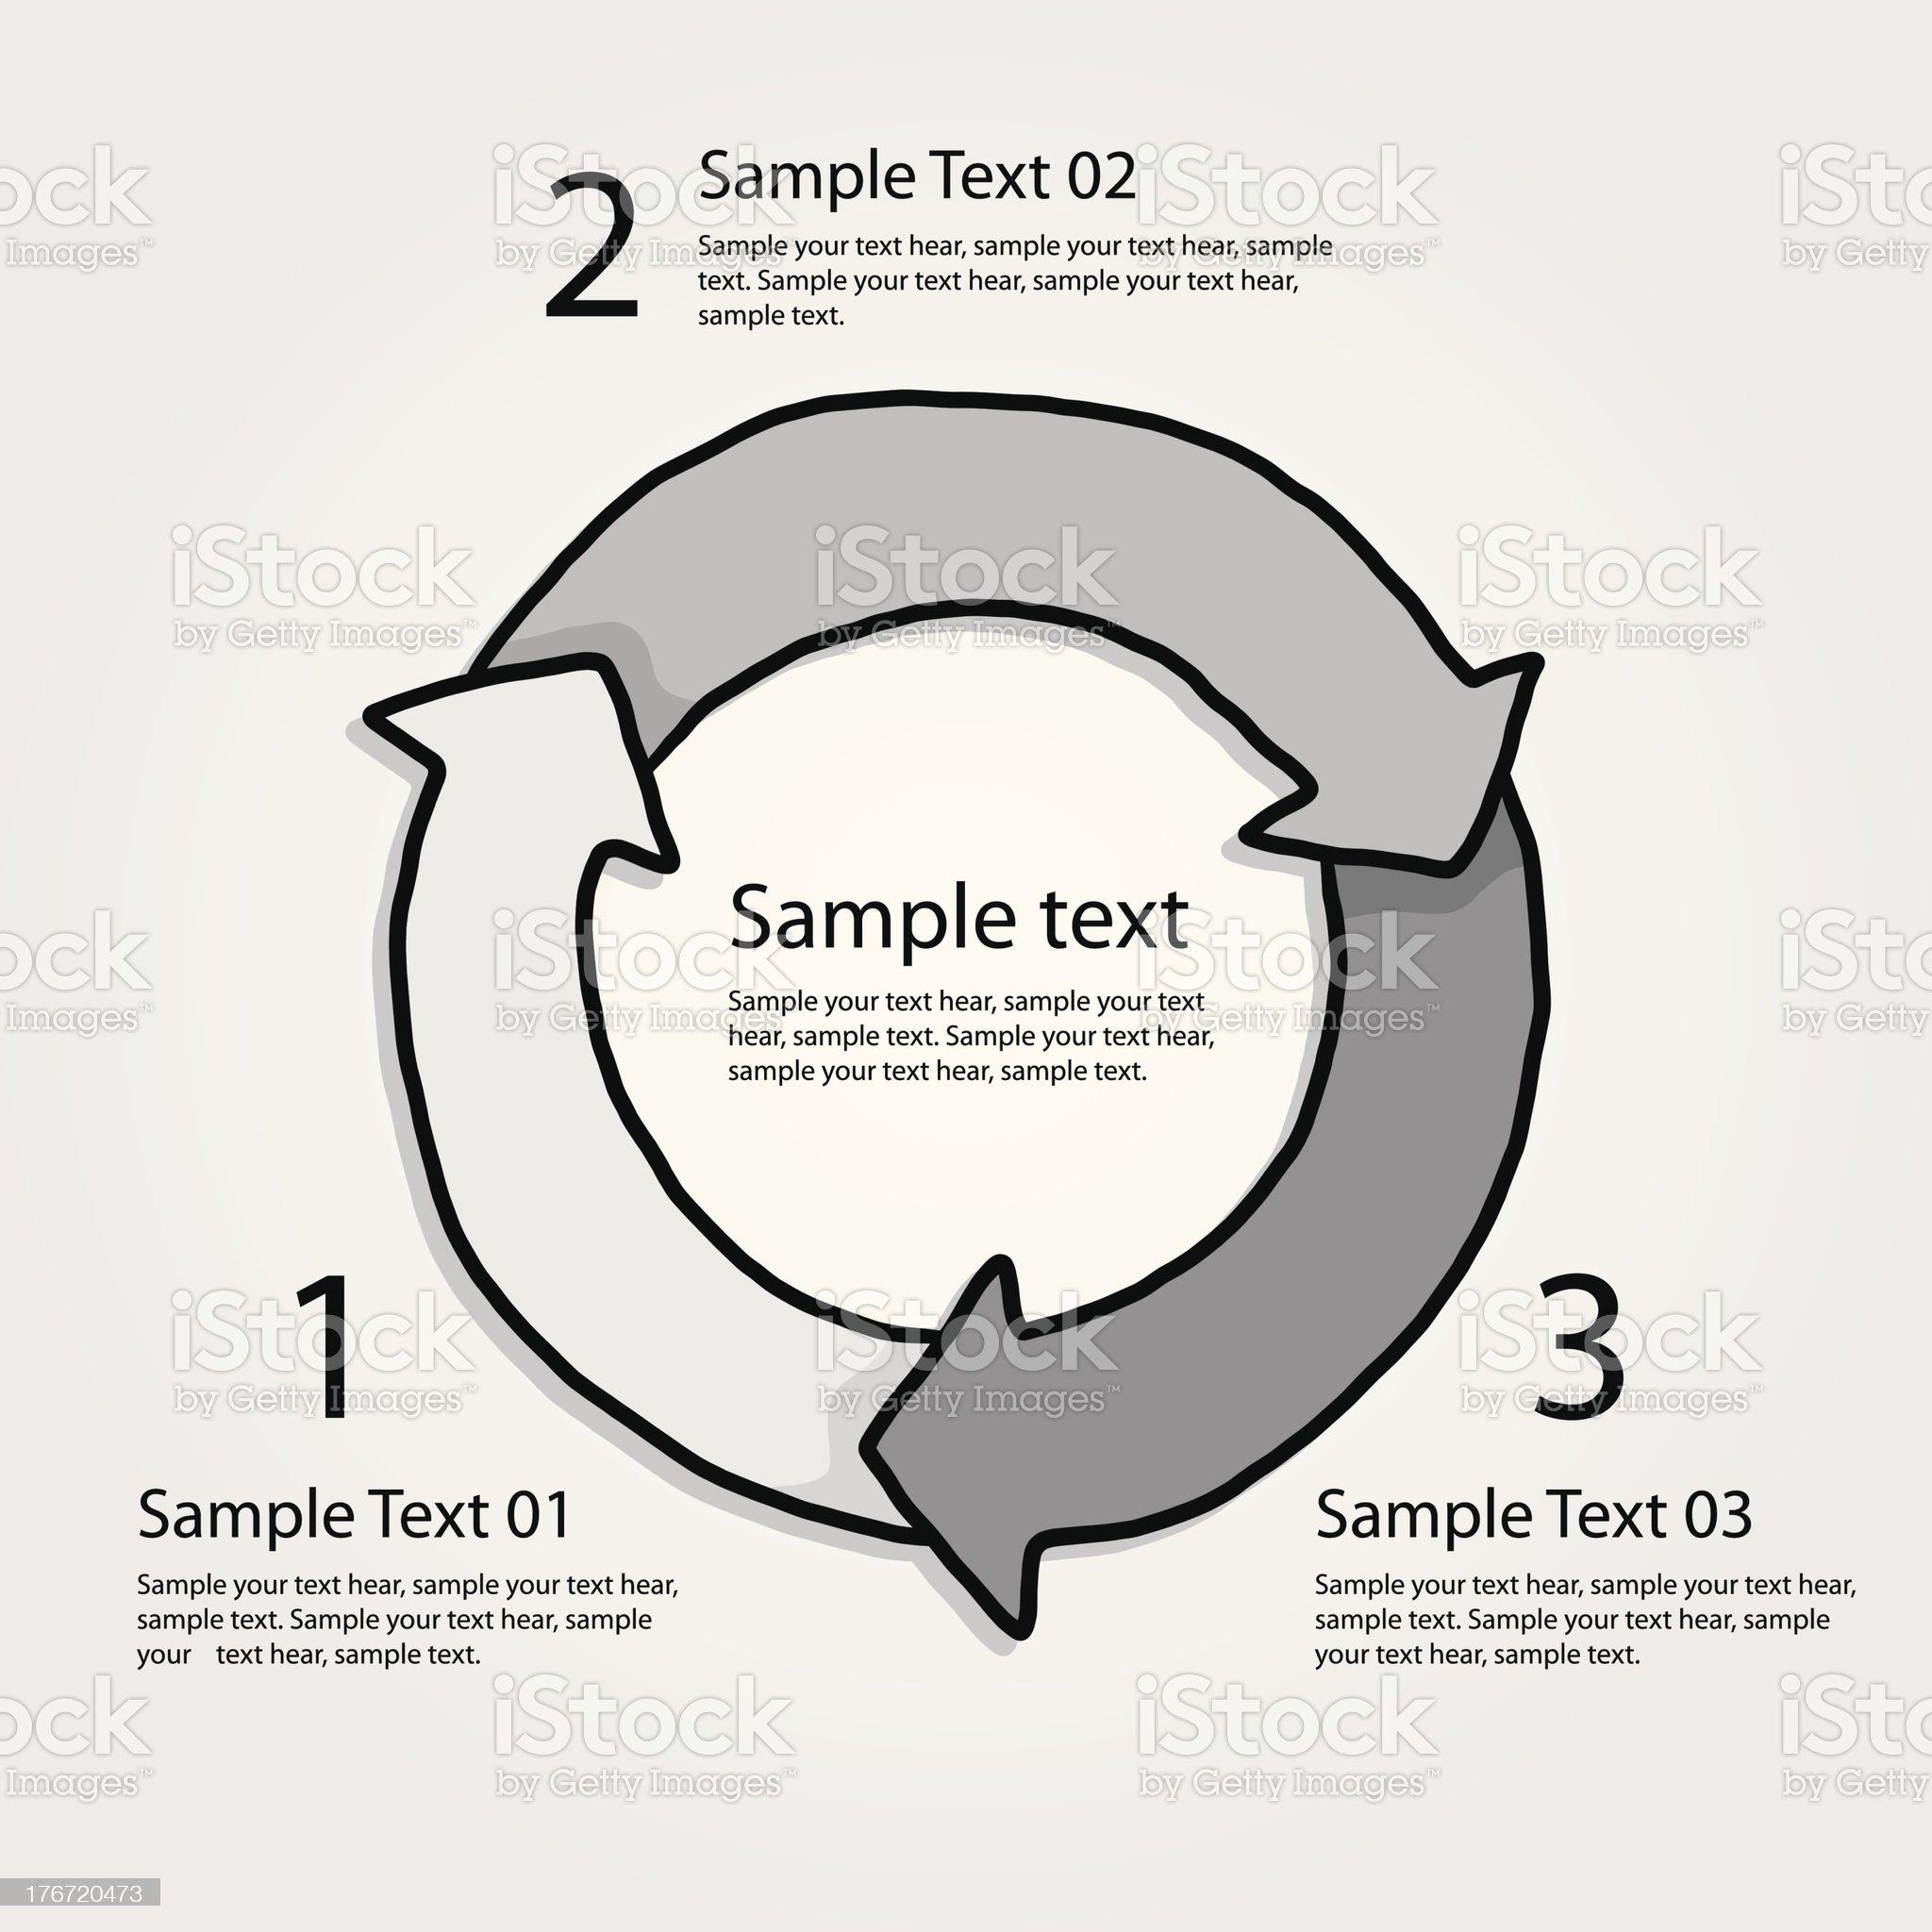 three steps circular arrow royalty-free stock vector art